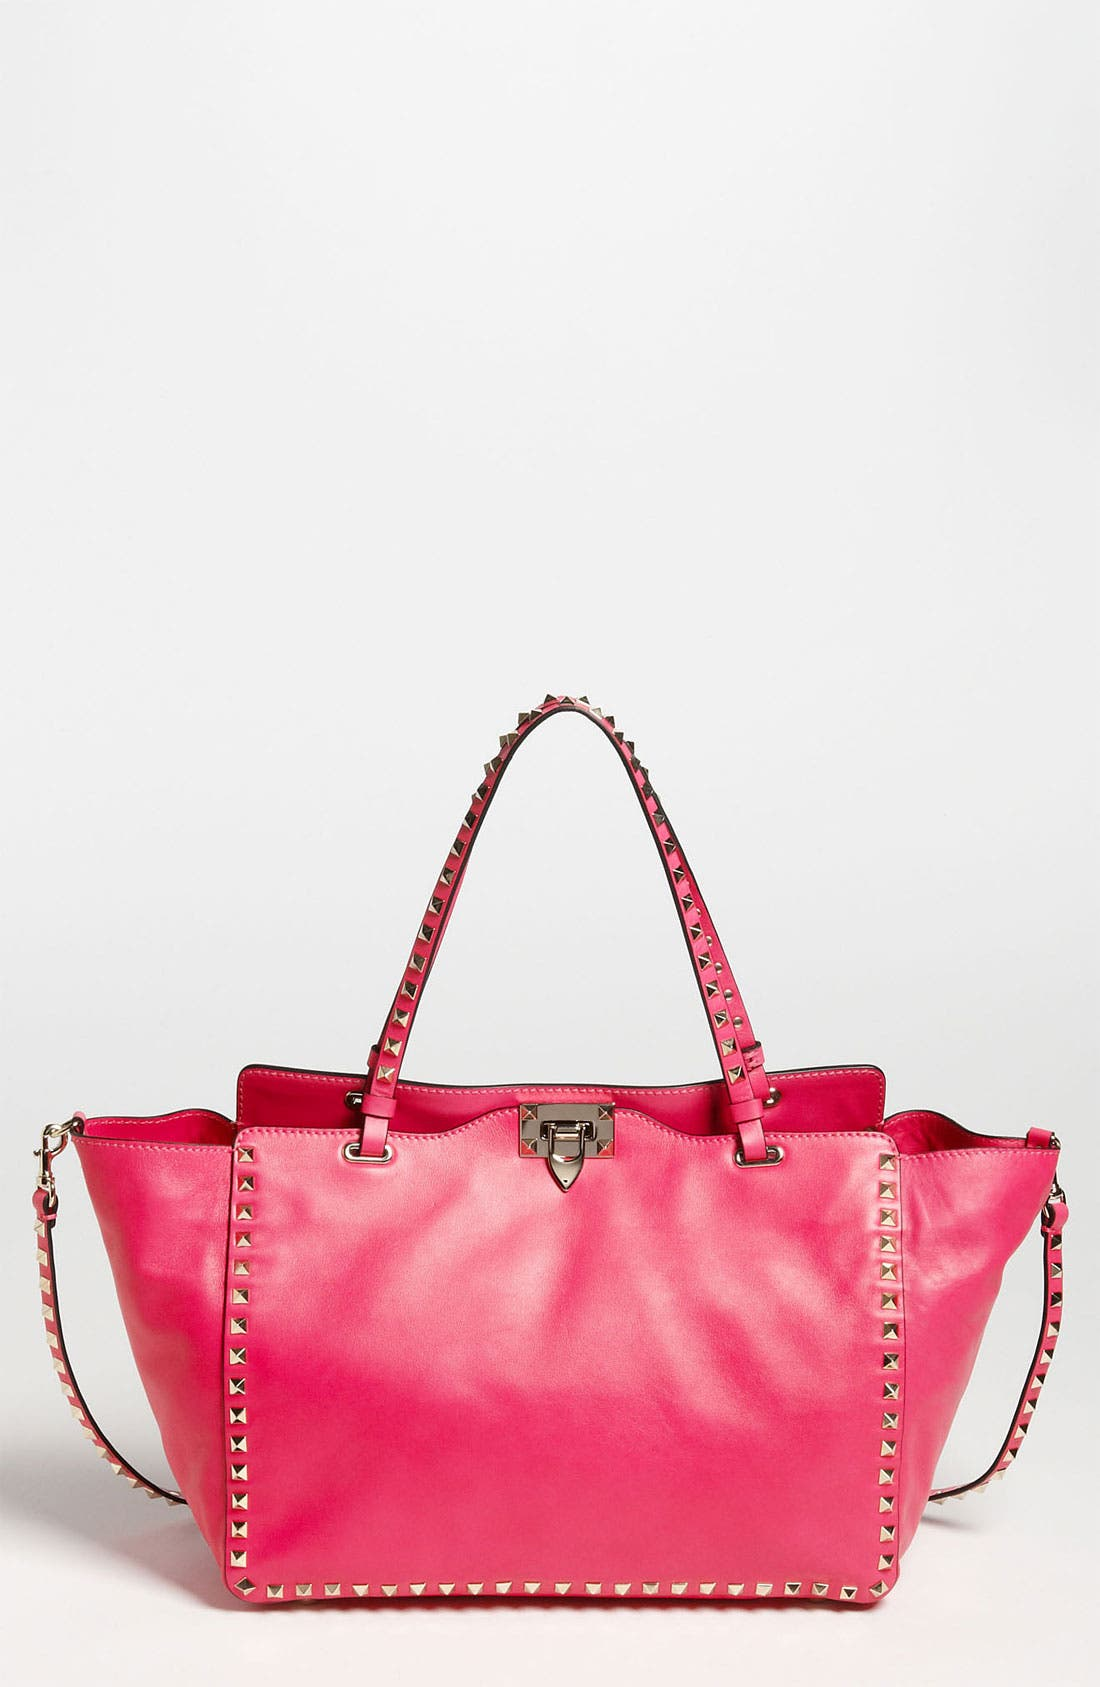 Main Image - Valentino 'Rockstud - Medium' Double Handle Leather Tote